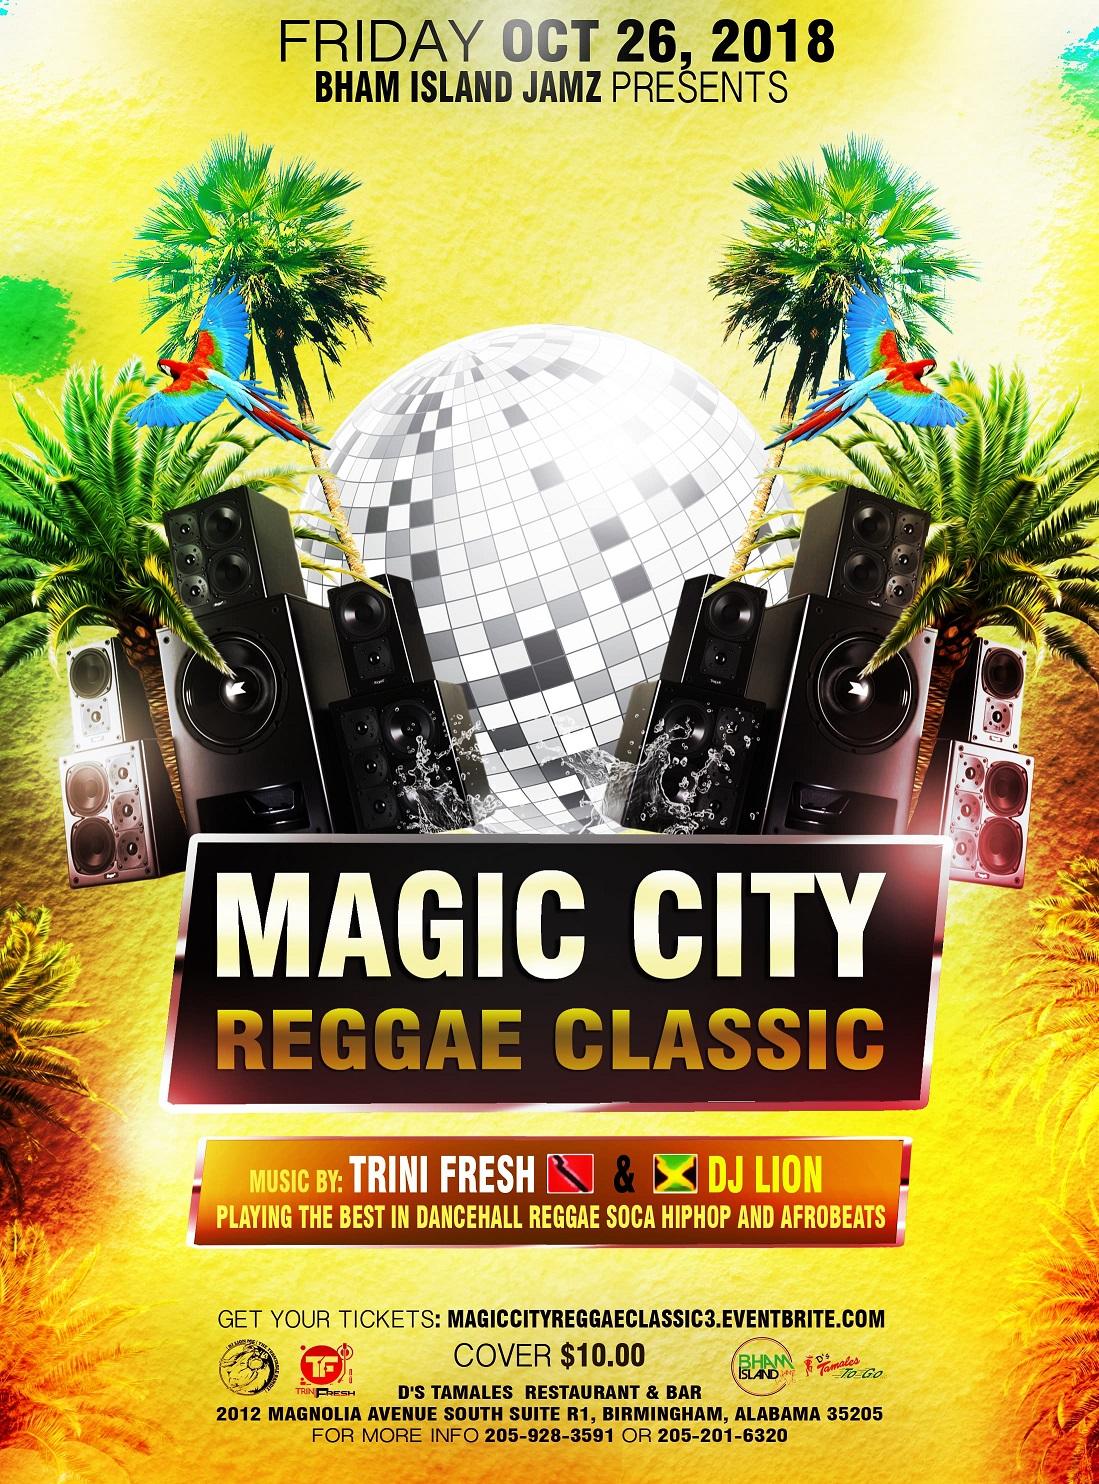 Magic City Reggae Classic presented by Birmingham Caribbean